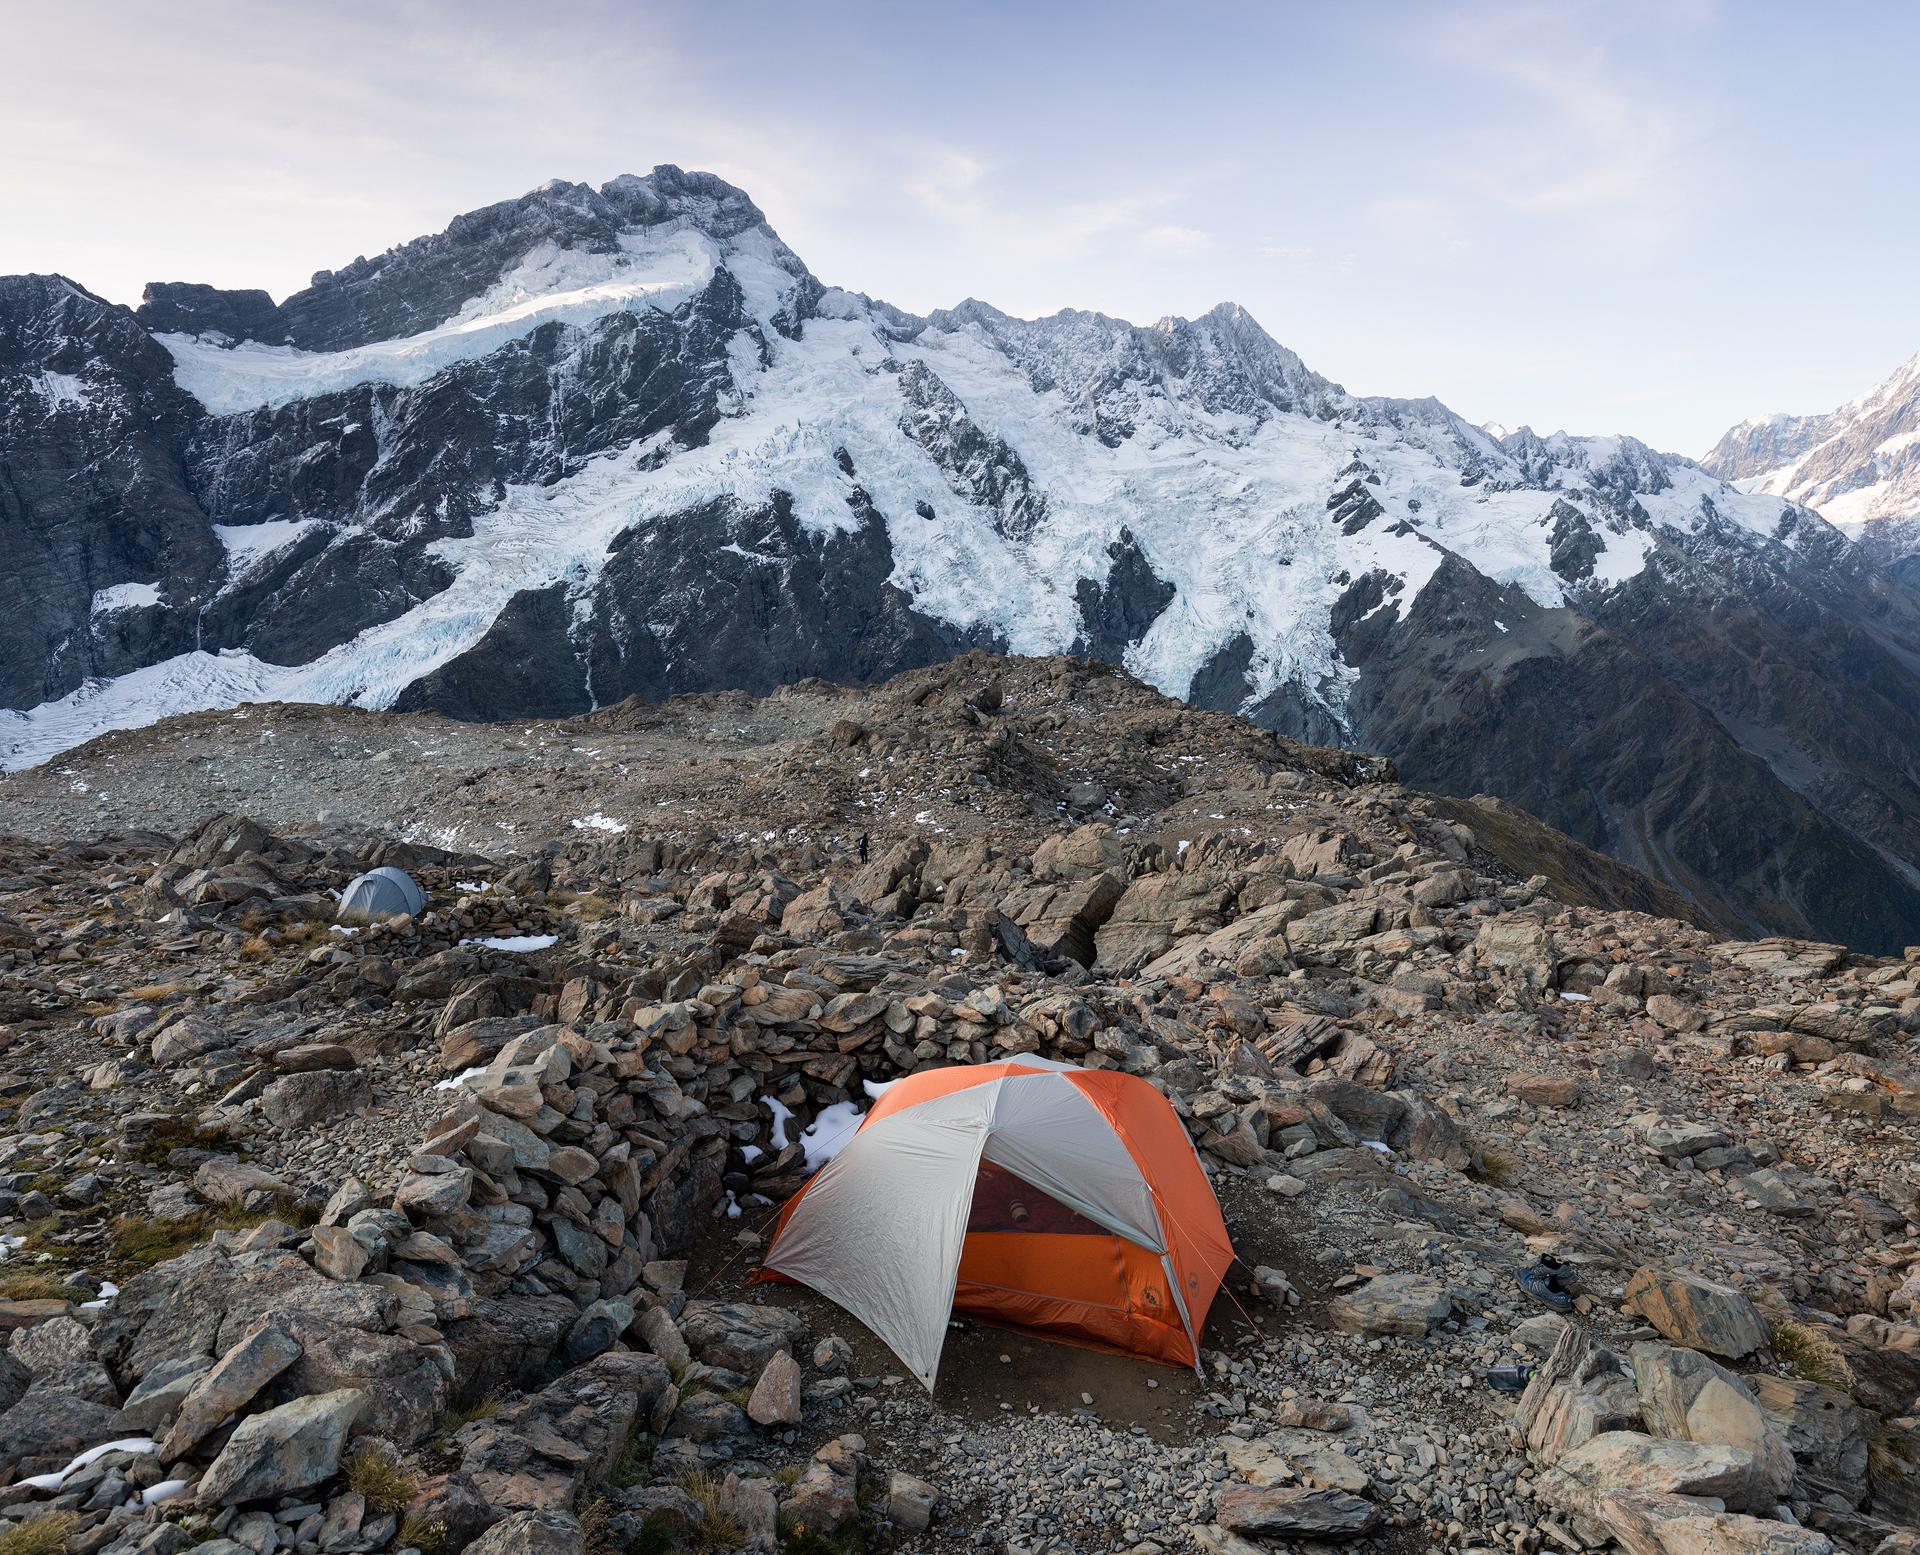 Our camp near Mueller Hut in Aoraki/Mount Cook National Park